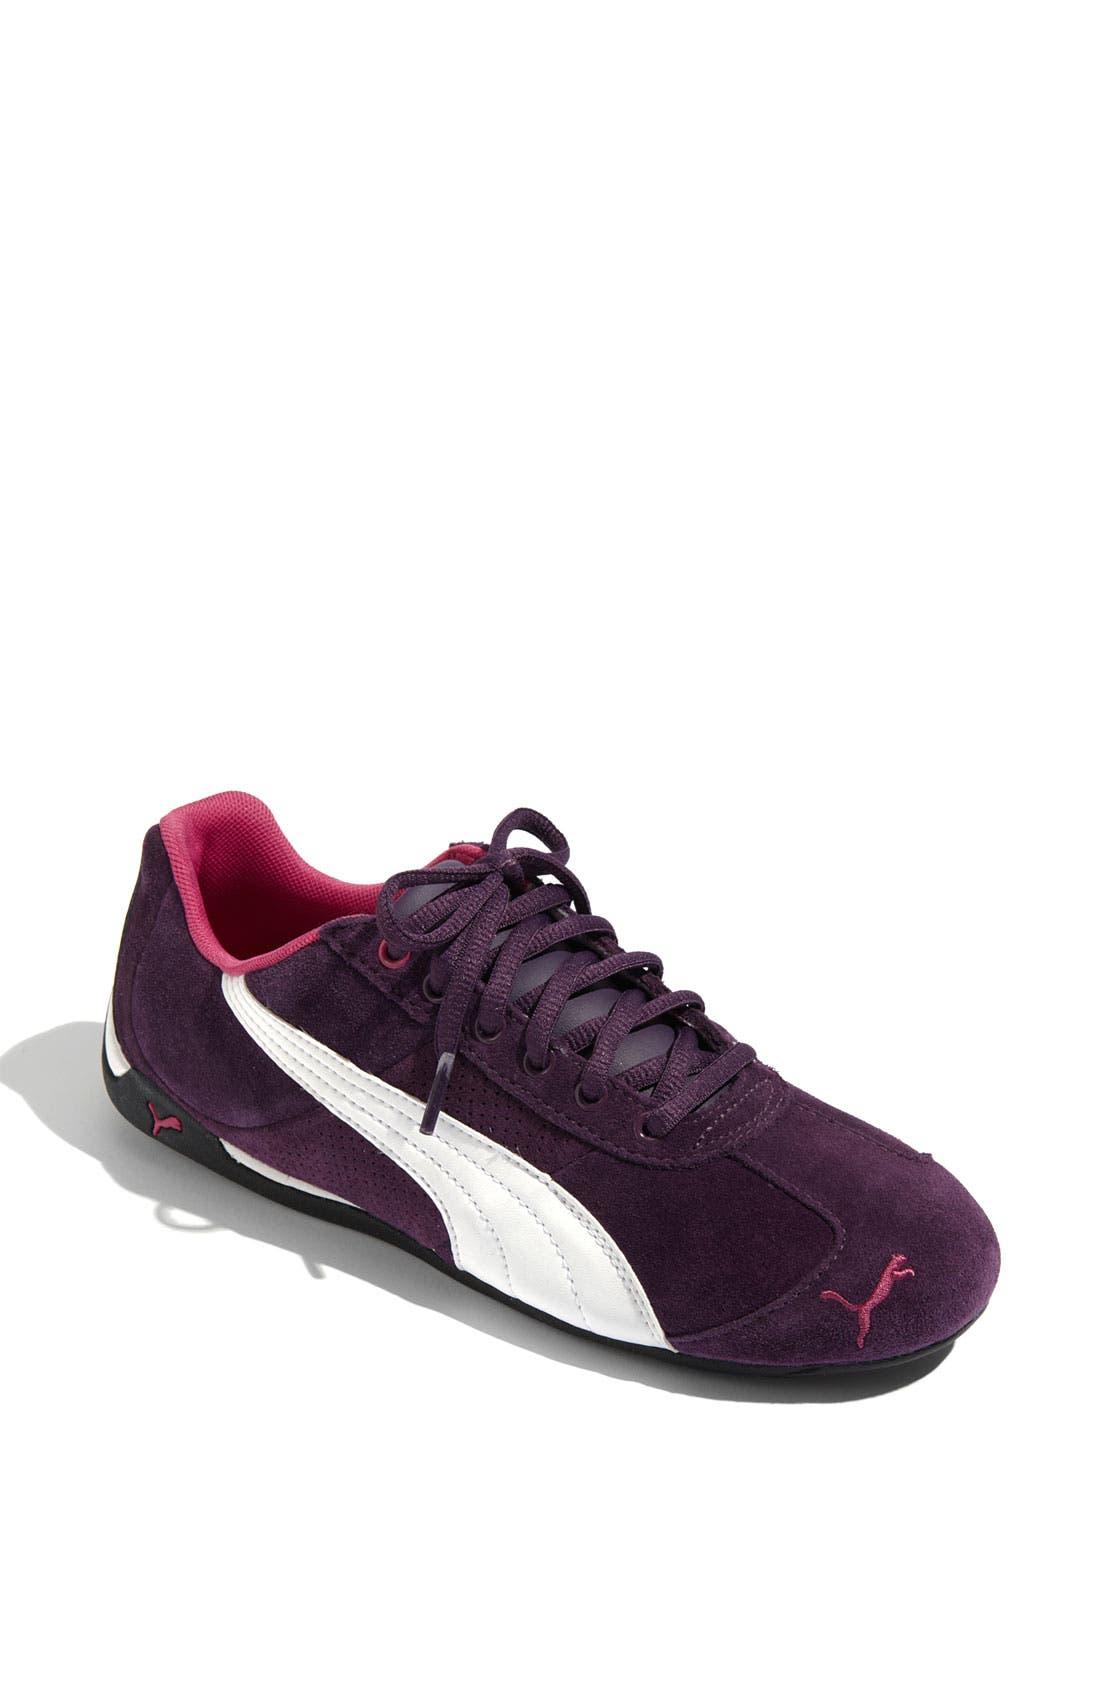 Main Image - PUMA 'Repli Cat III' Sneaker (Women)